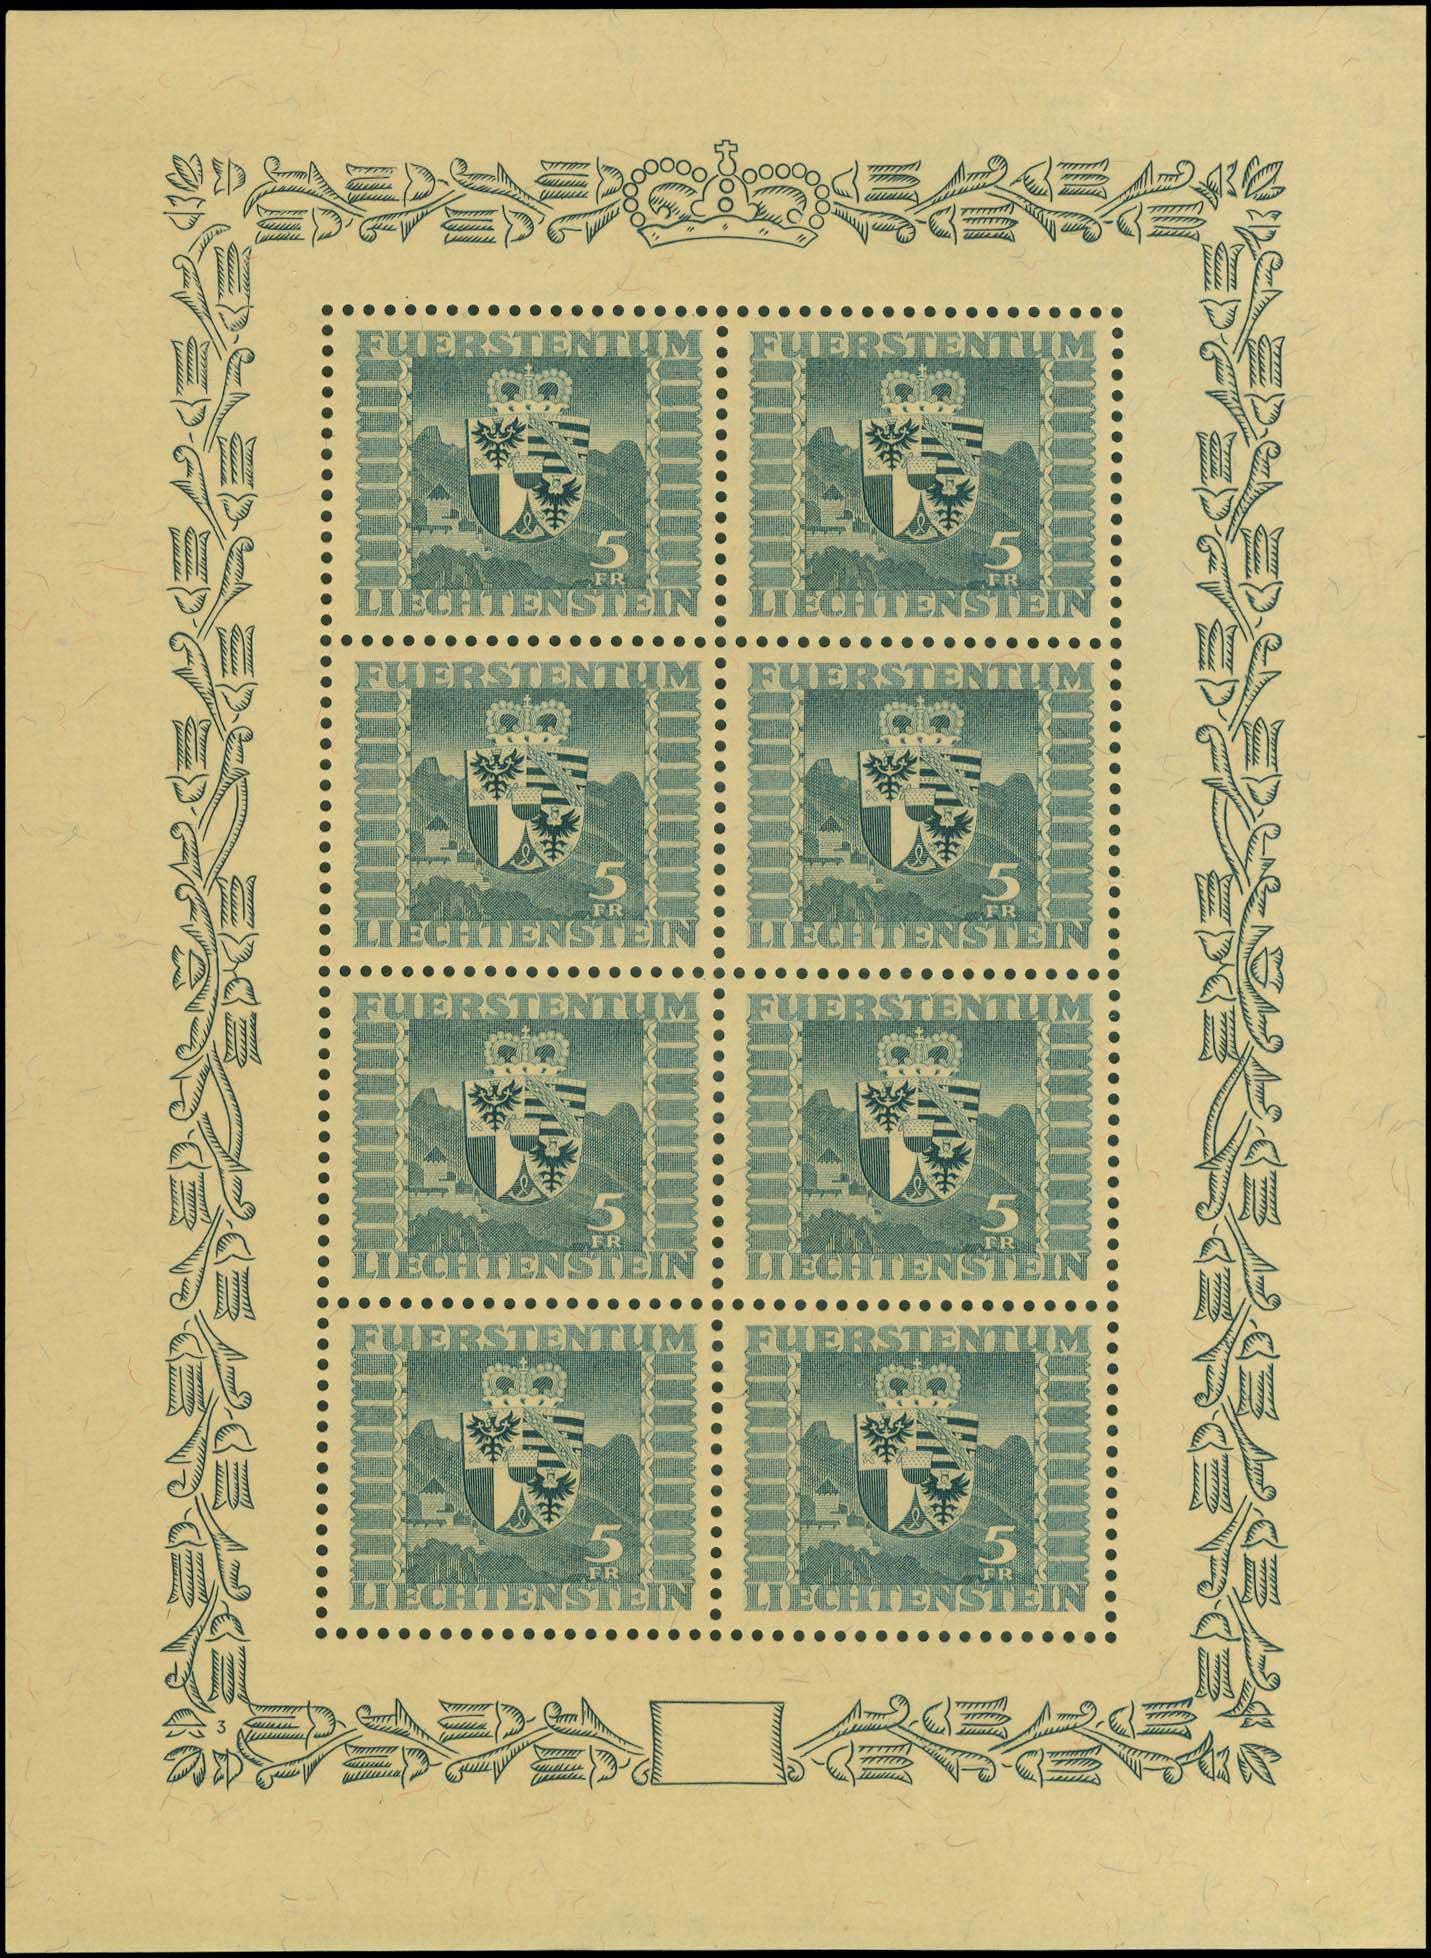 Lot 2056 - -  FOREIGN COUNTRIES Liechtenstein -  A. Karamitsos Public Auction 652 General Stamp Sale